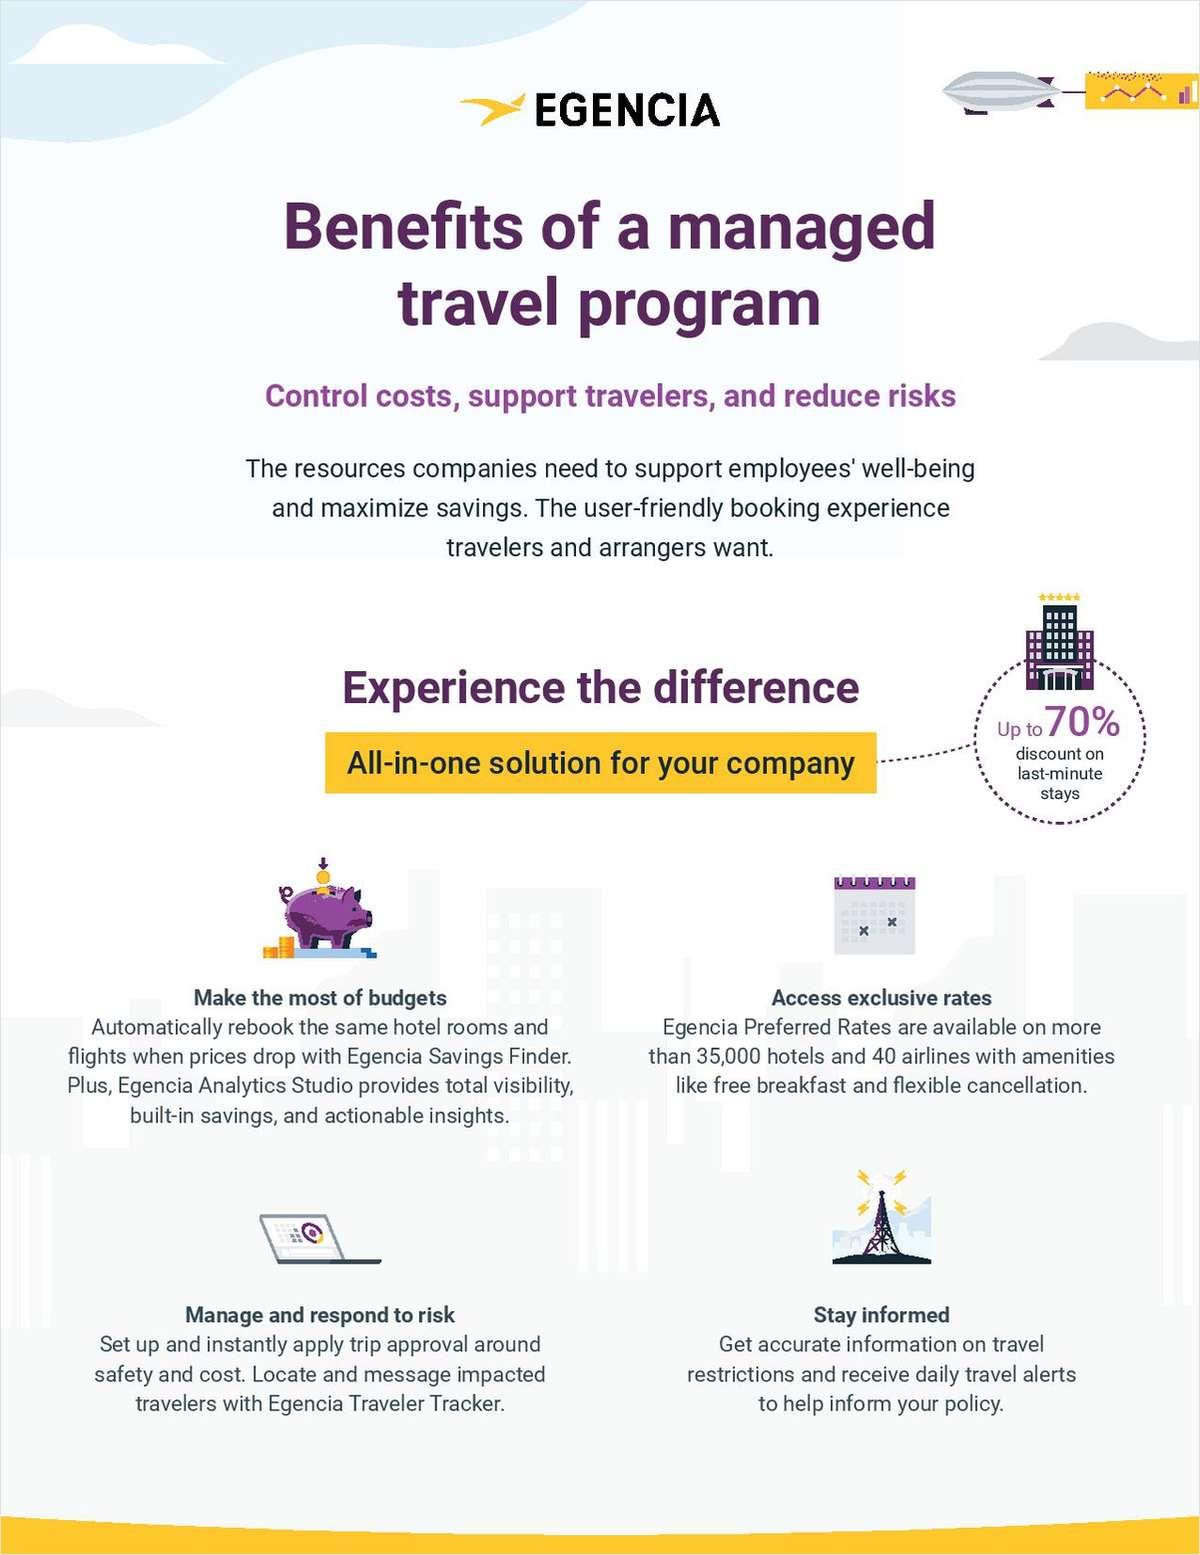 Benefits of a Managed Travel Program